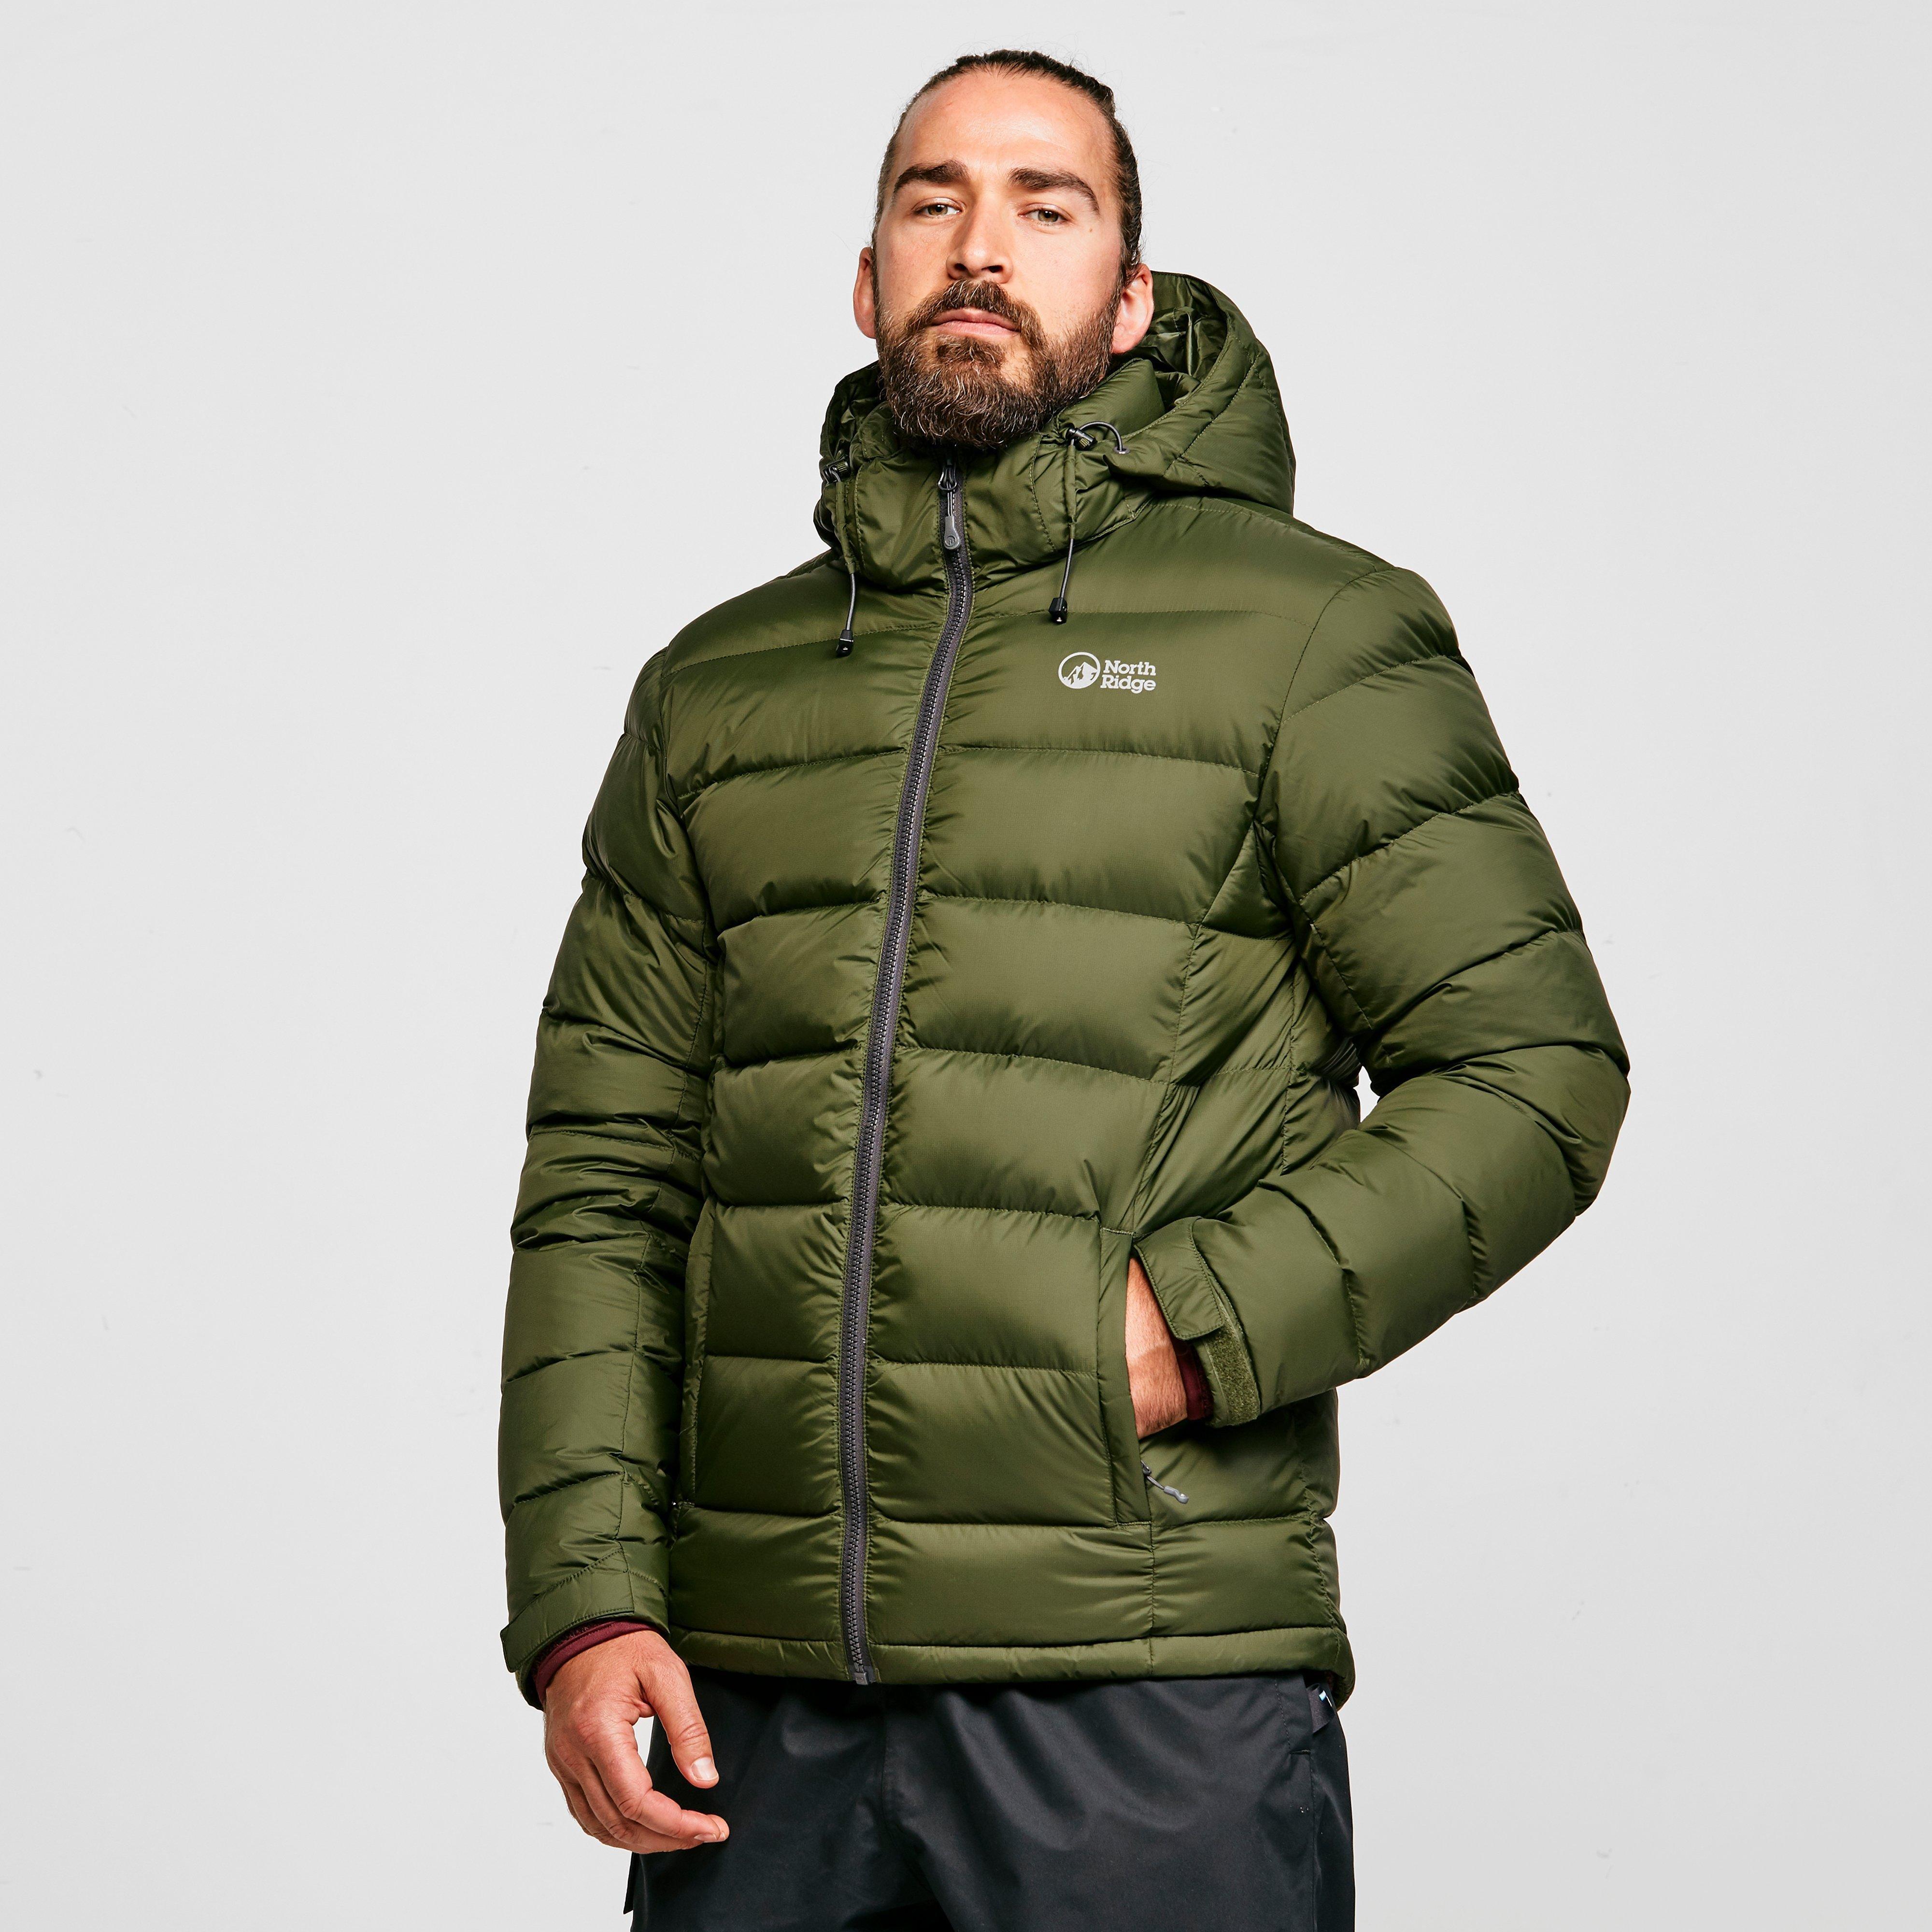 North Ridge Men's Tech Down Jacket - Green/Blu, Green